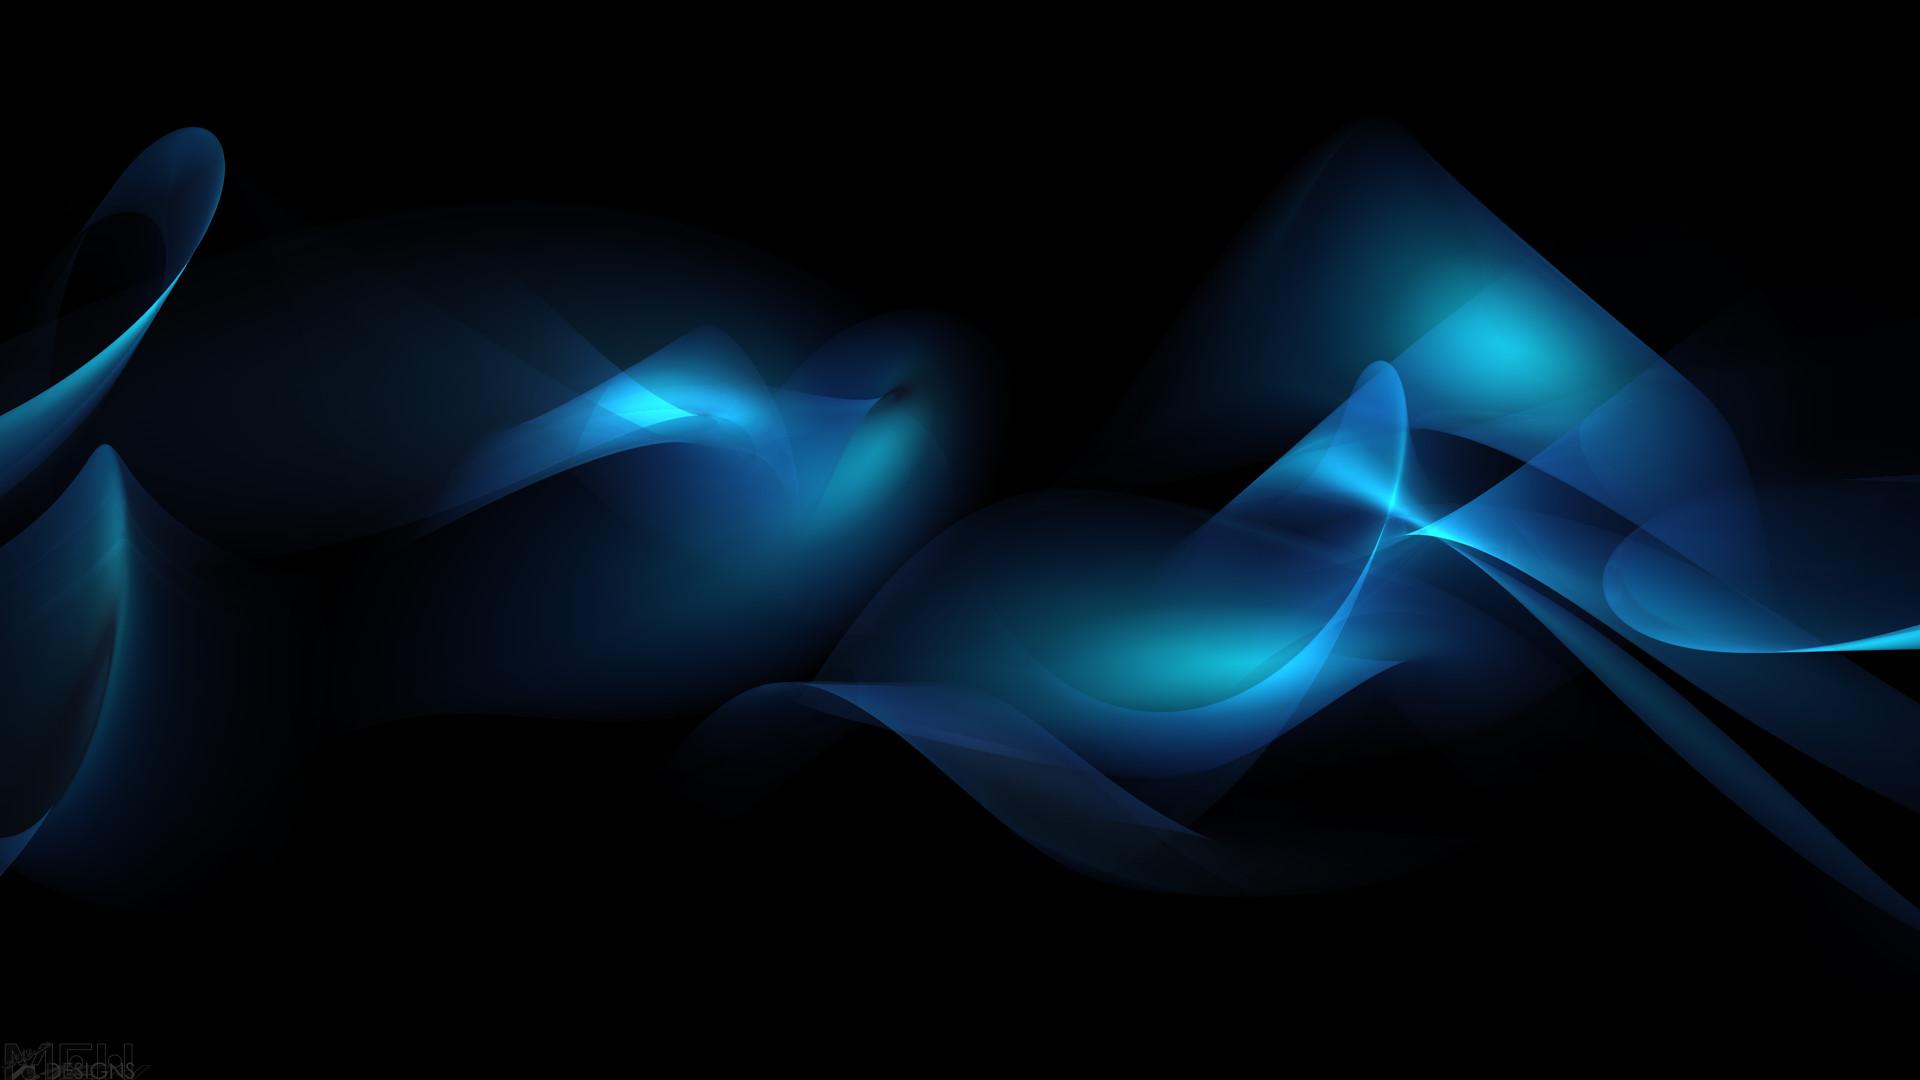 Blue Desktop Wallpaper